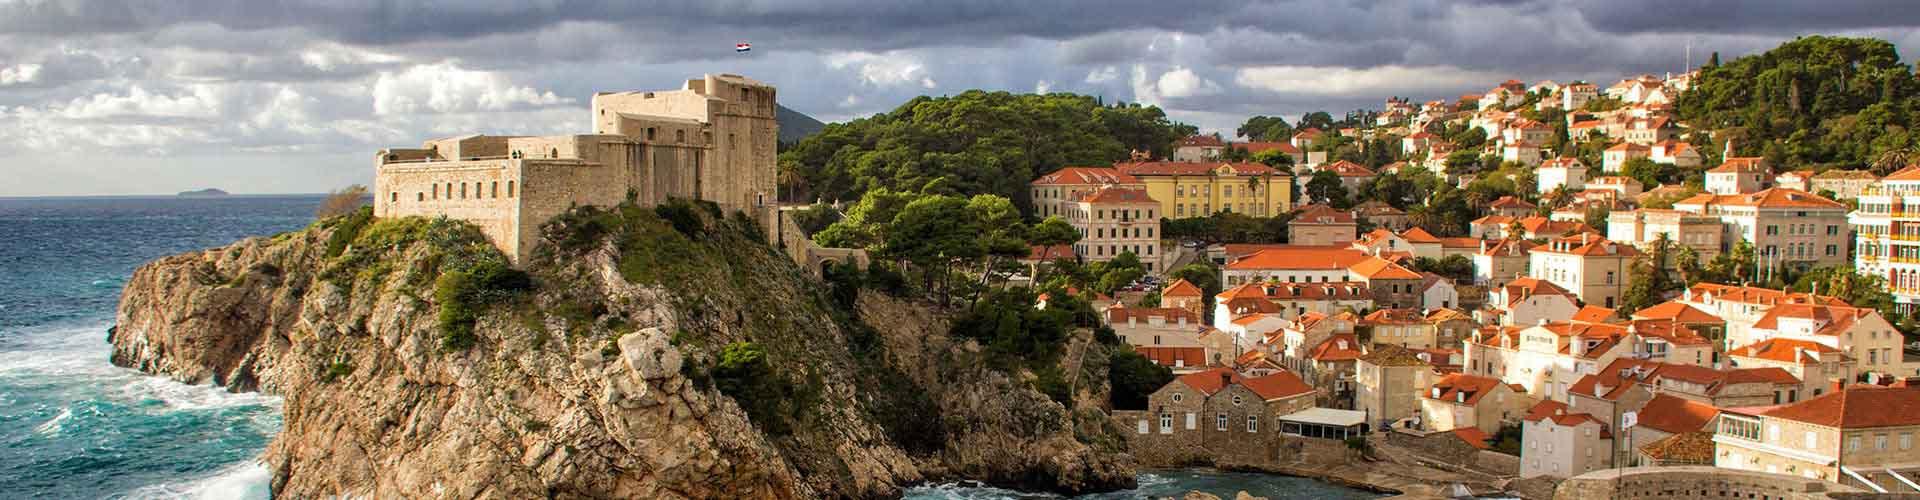 Dubrovnik - Apartamentos en Dubrovnik. Mapas de Dubrovnik, Fotos y comentarios de cada Apartamento en Dubrovnik.